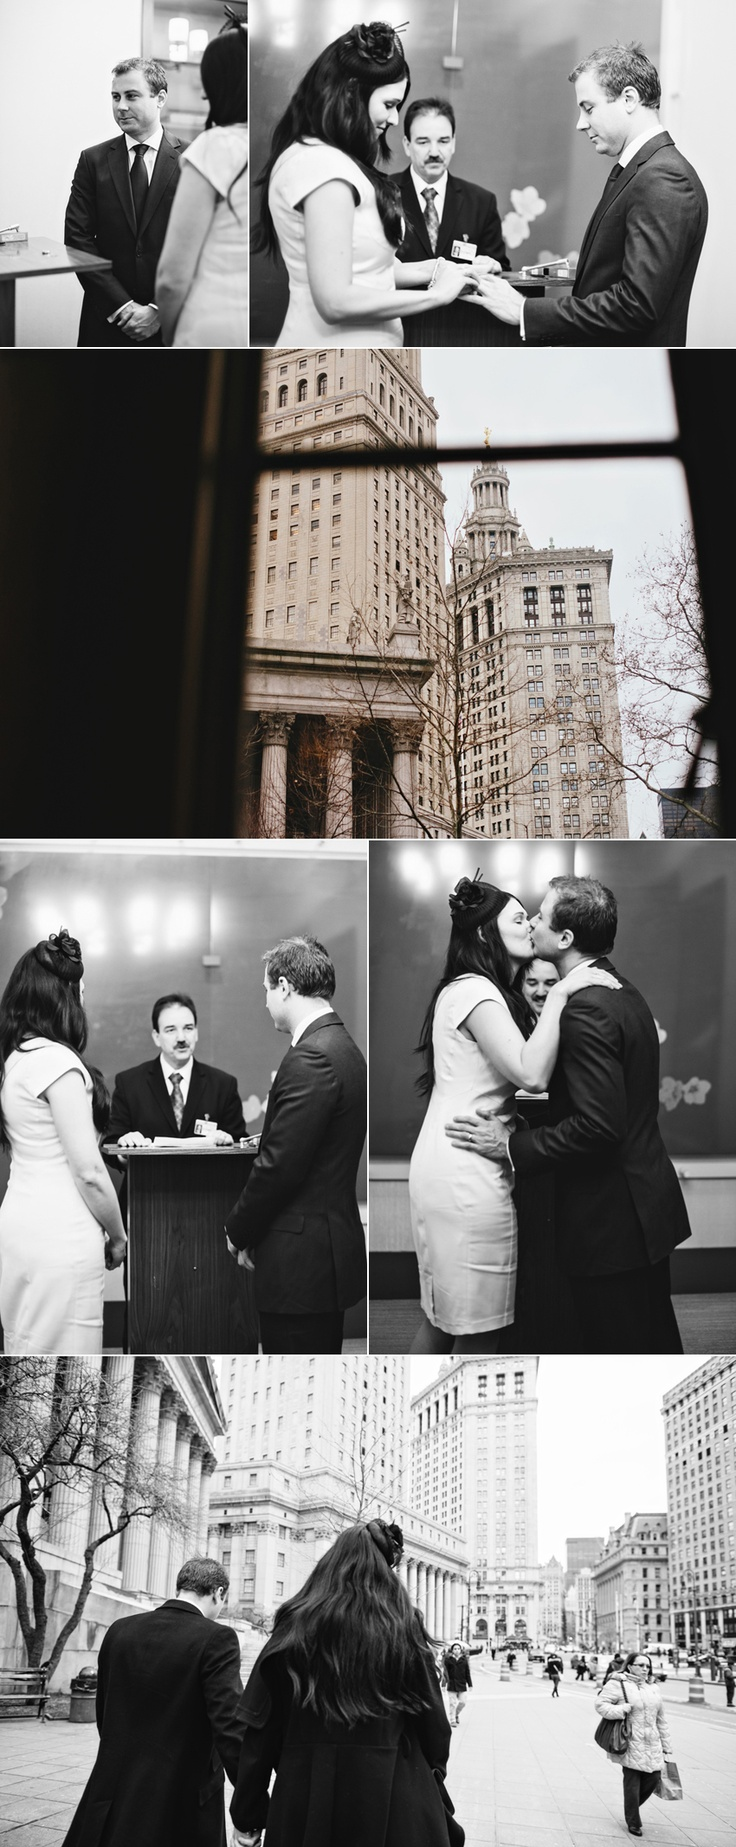 wedding ceremony new york city%0A Elopement in New York City  Civil wedding ceremony  Photo by Katie Jane  Photo